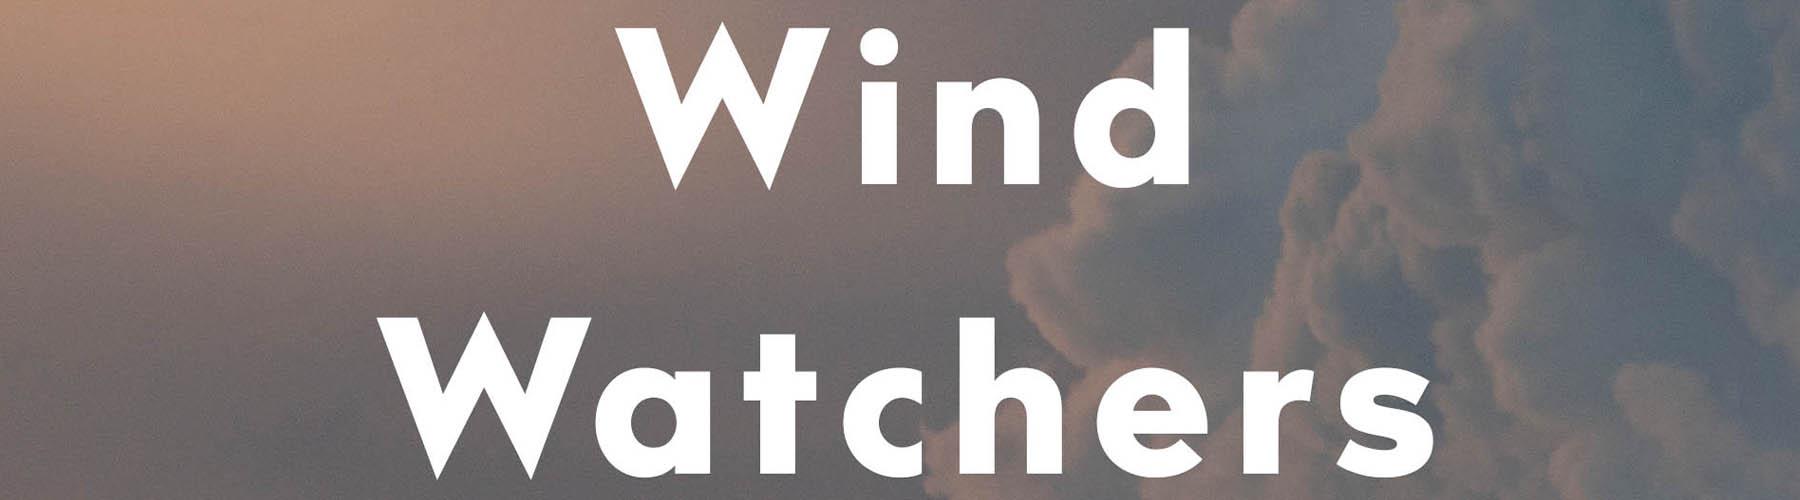 Wind Watchers